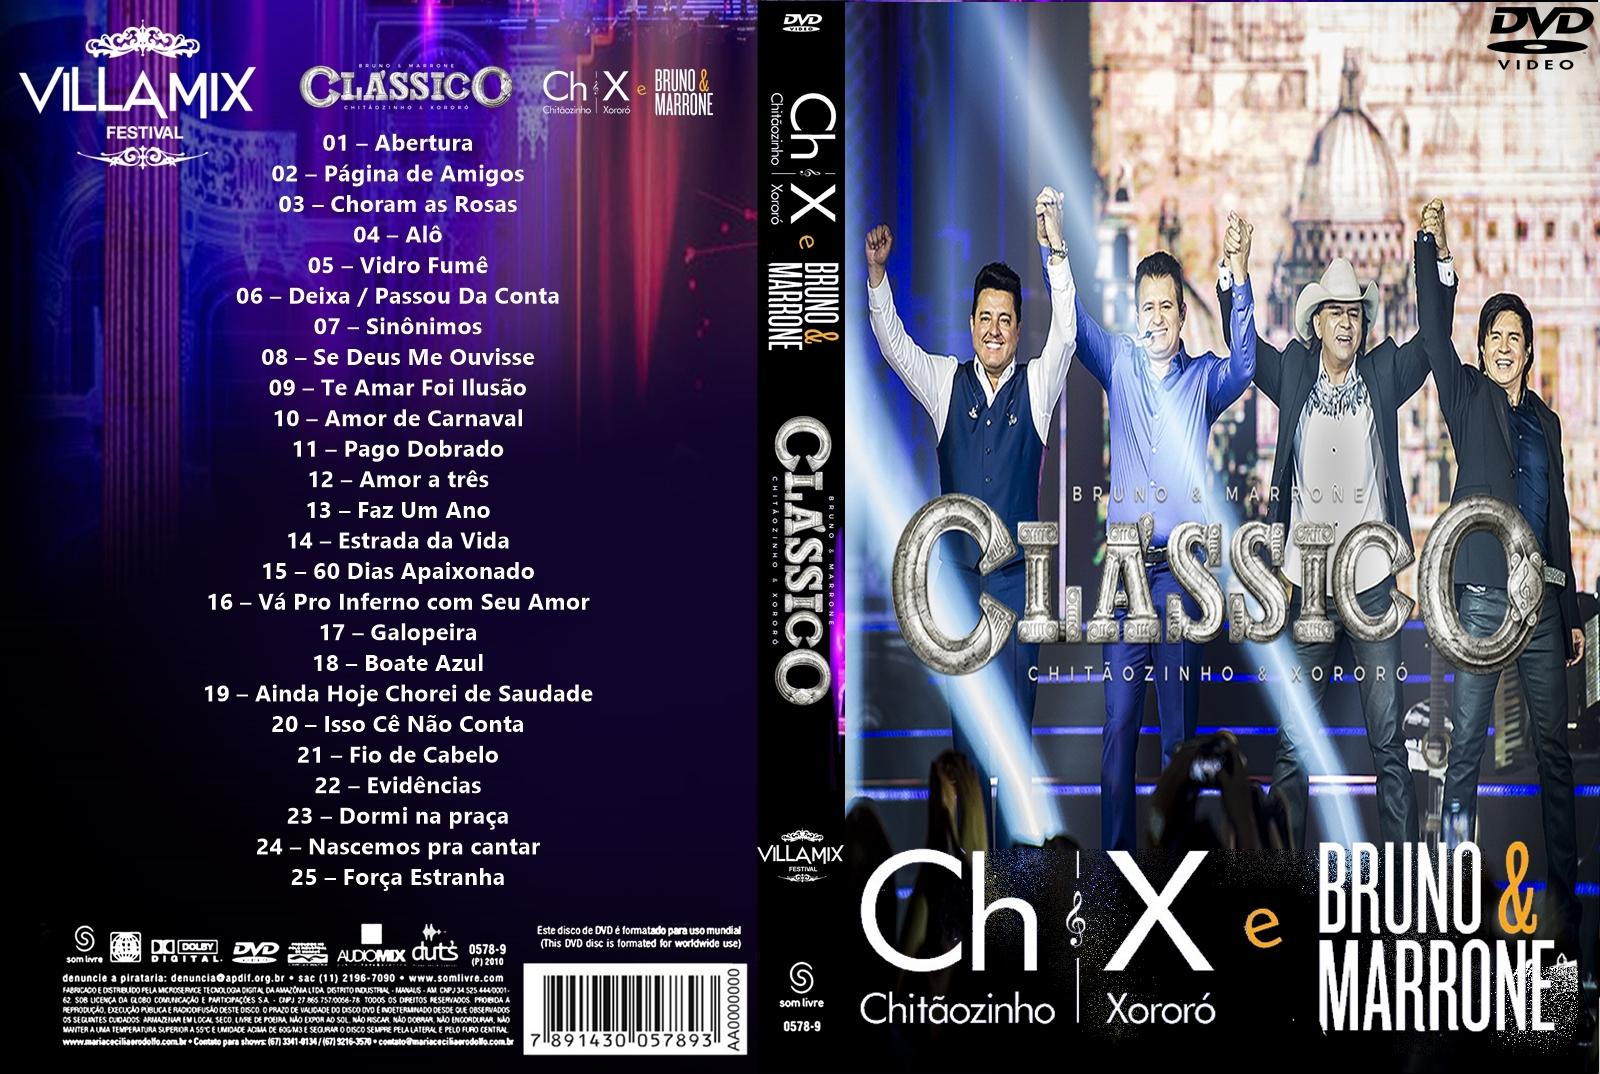 Download Bruno & Marrone e Chitãozinho & Xororó Clássico DVD-R Download Bruno & Marrone e Chitãozinho & Xororó Clássico DVD-R Bruno 2B 2526 2BMarrone 2Be 2BChit 25C3 25A3ozinho 2B 2526 2BXoror 25C3 25B3 2B  2BCl 25C3 25A1ssico 2B 2528CAPA 2529